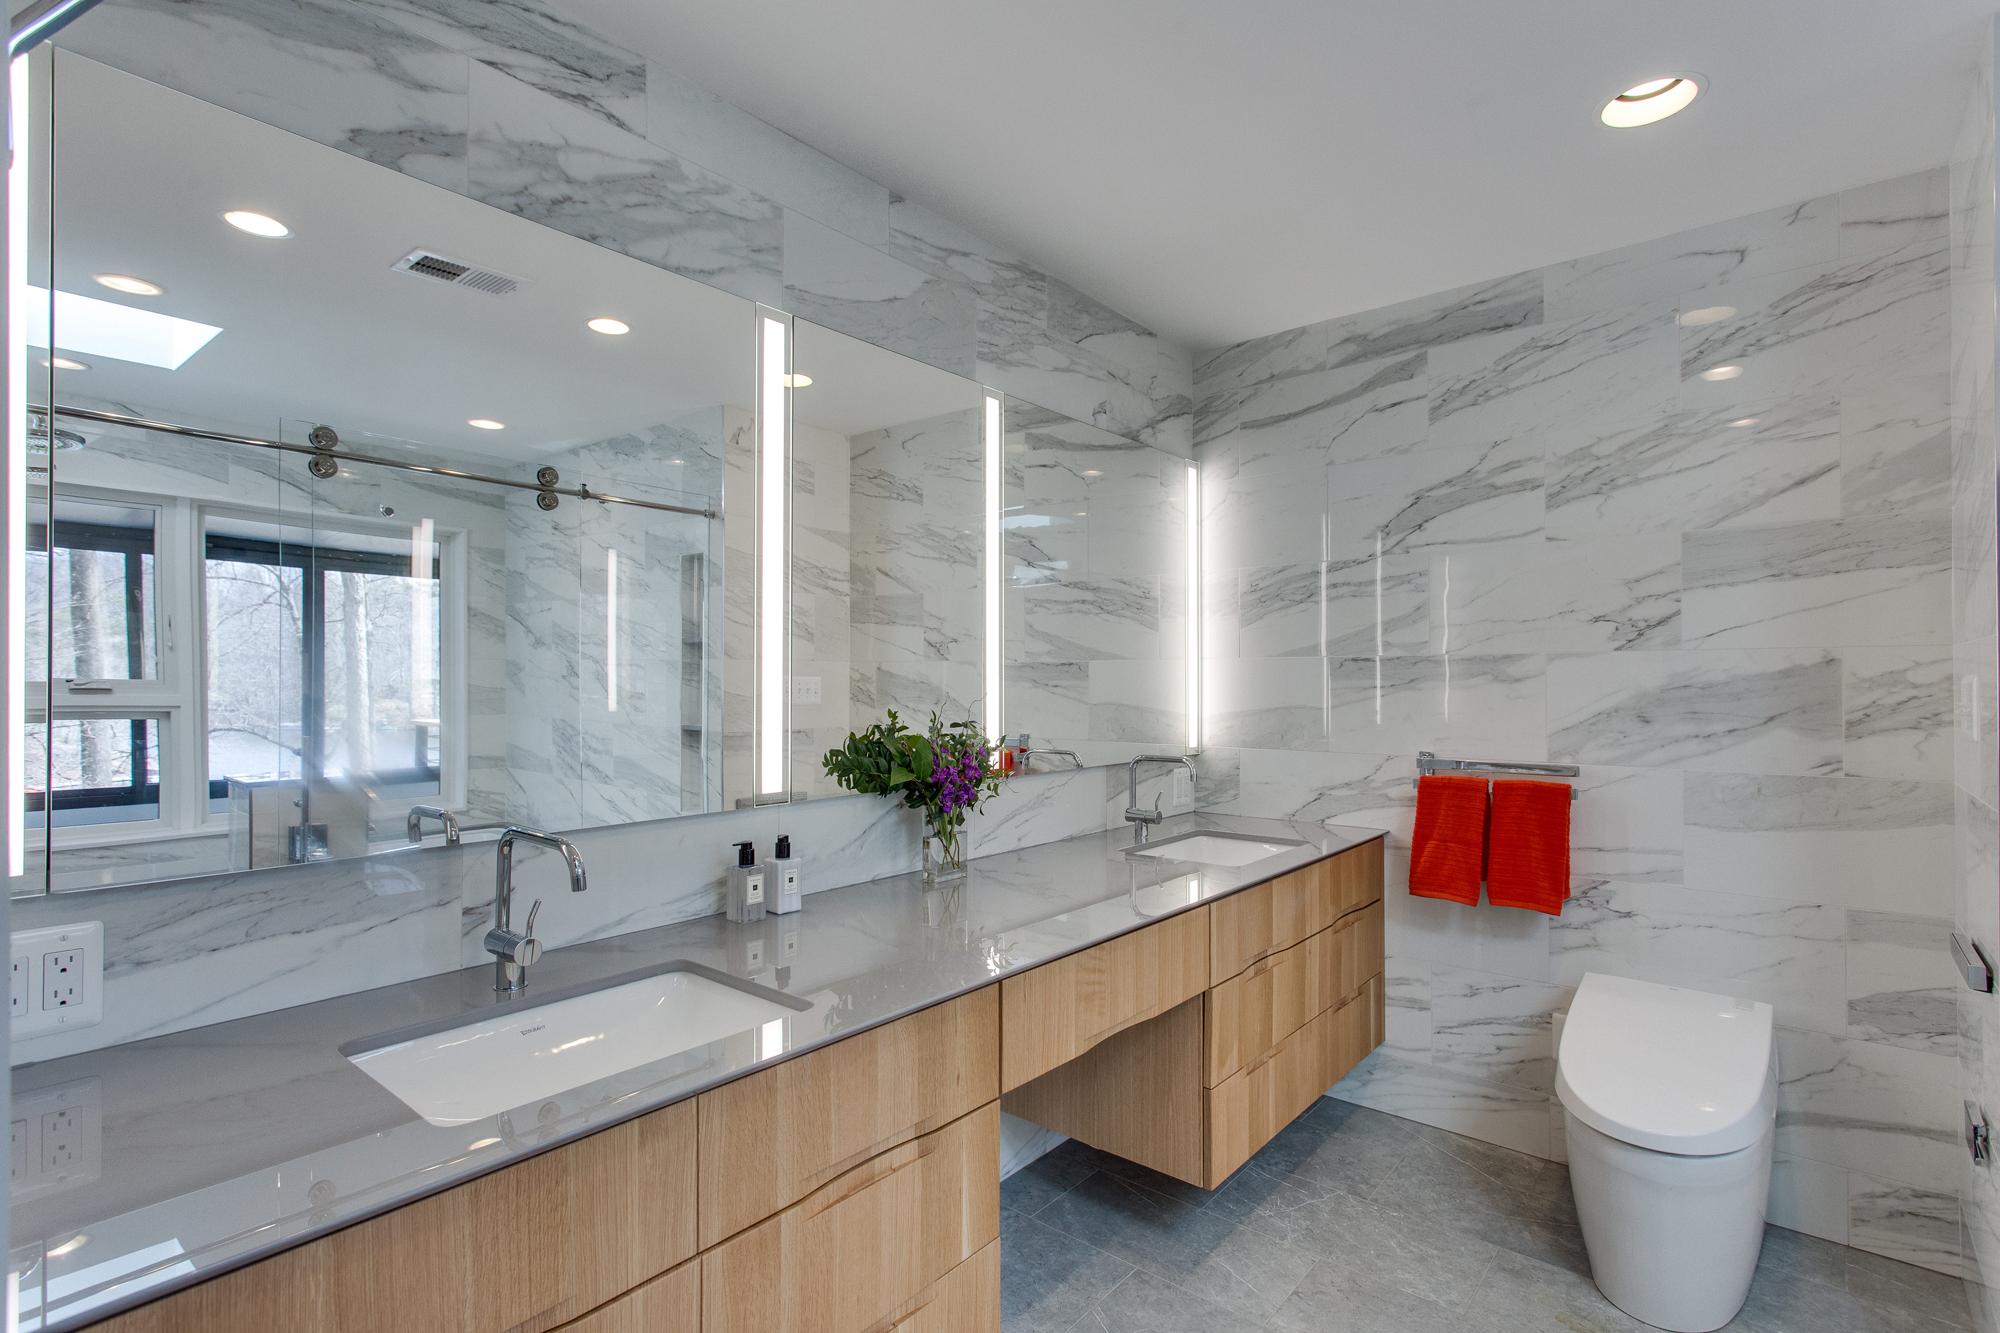 Master baths bathrooms photos gallery bowa design build renovations for Bathroom remodeler falls church va